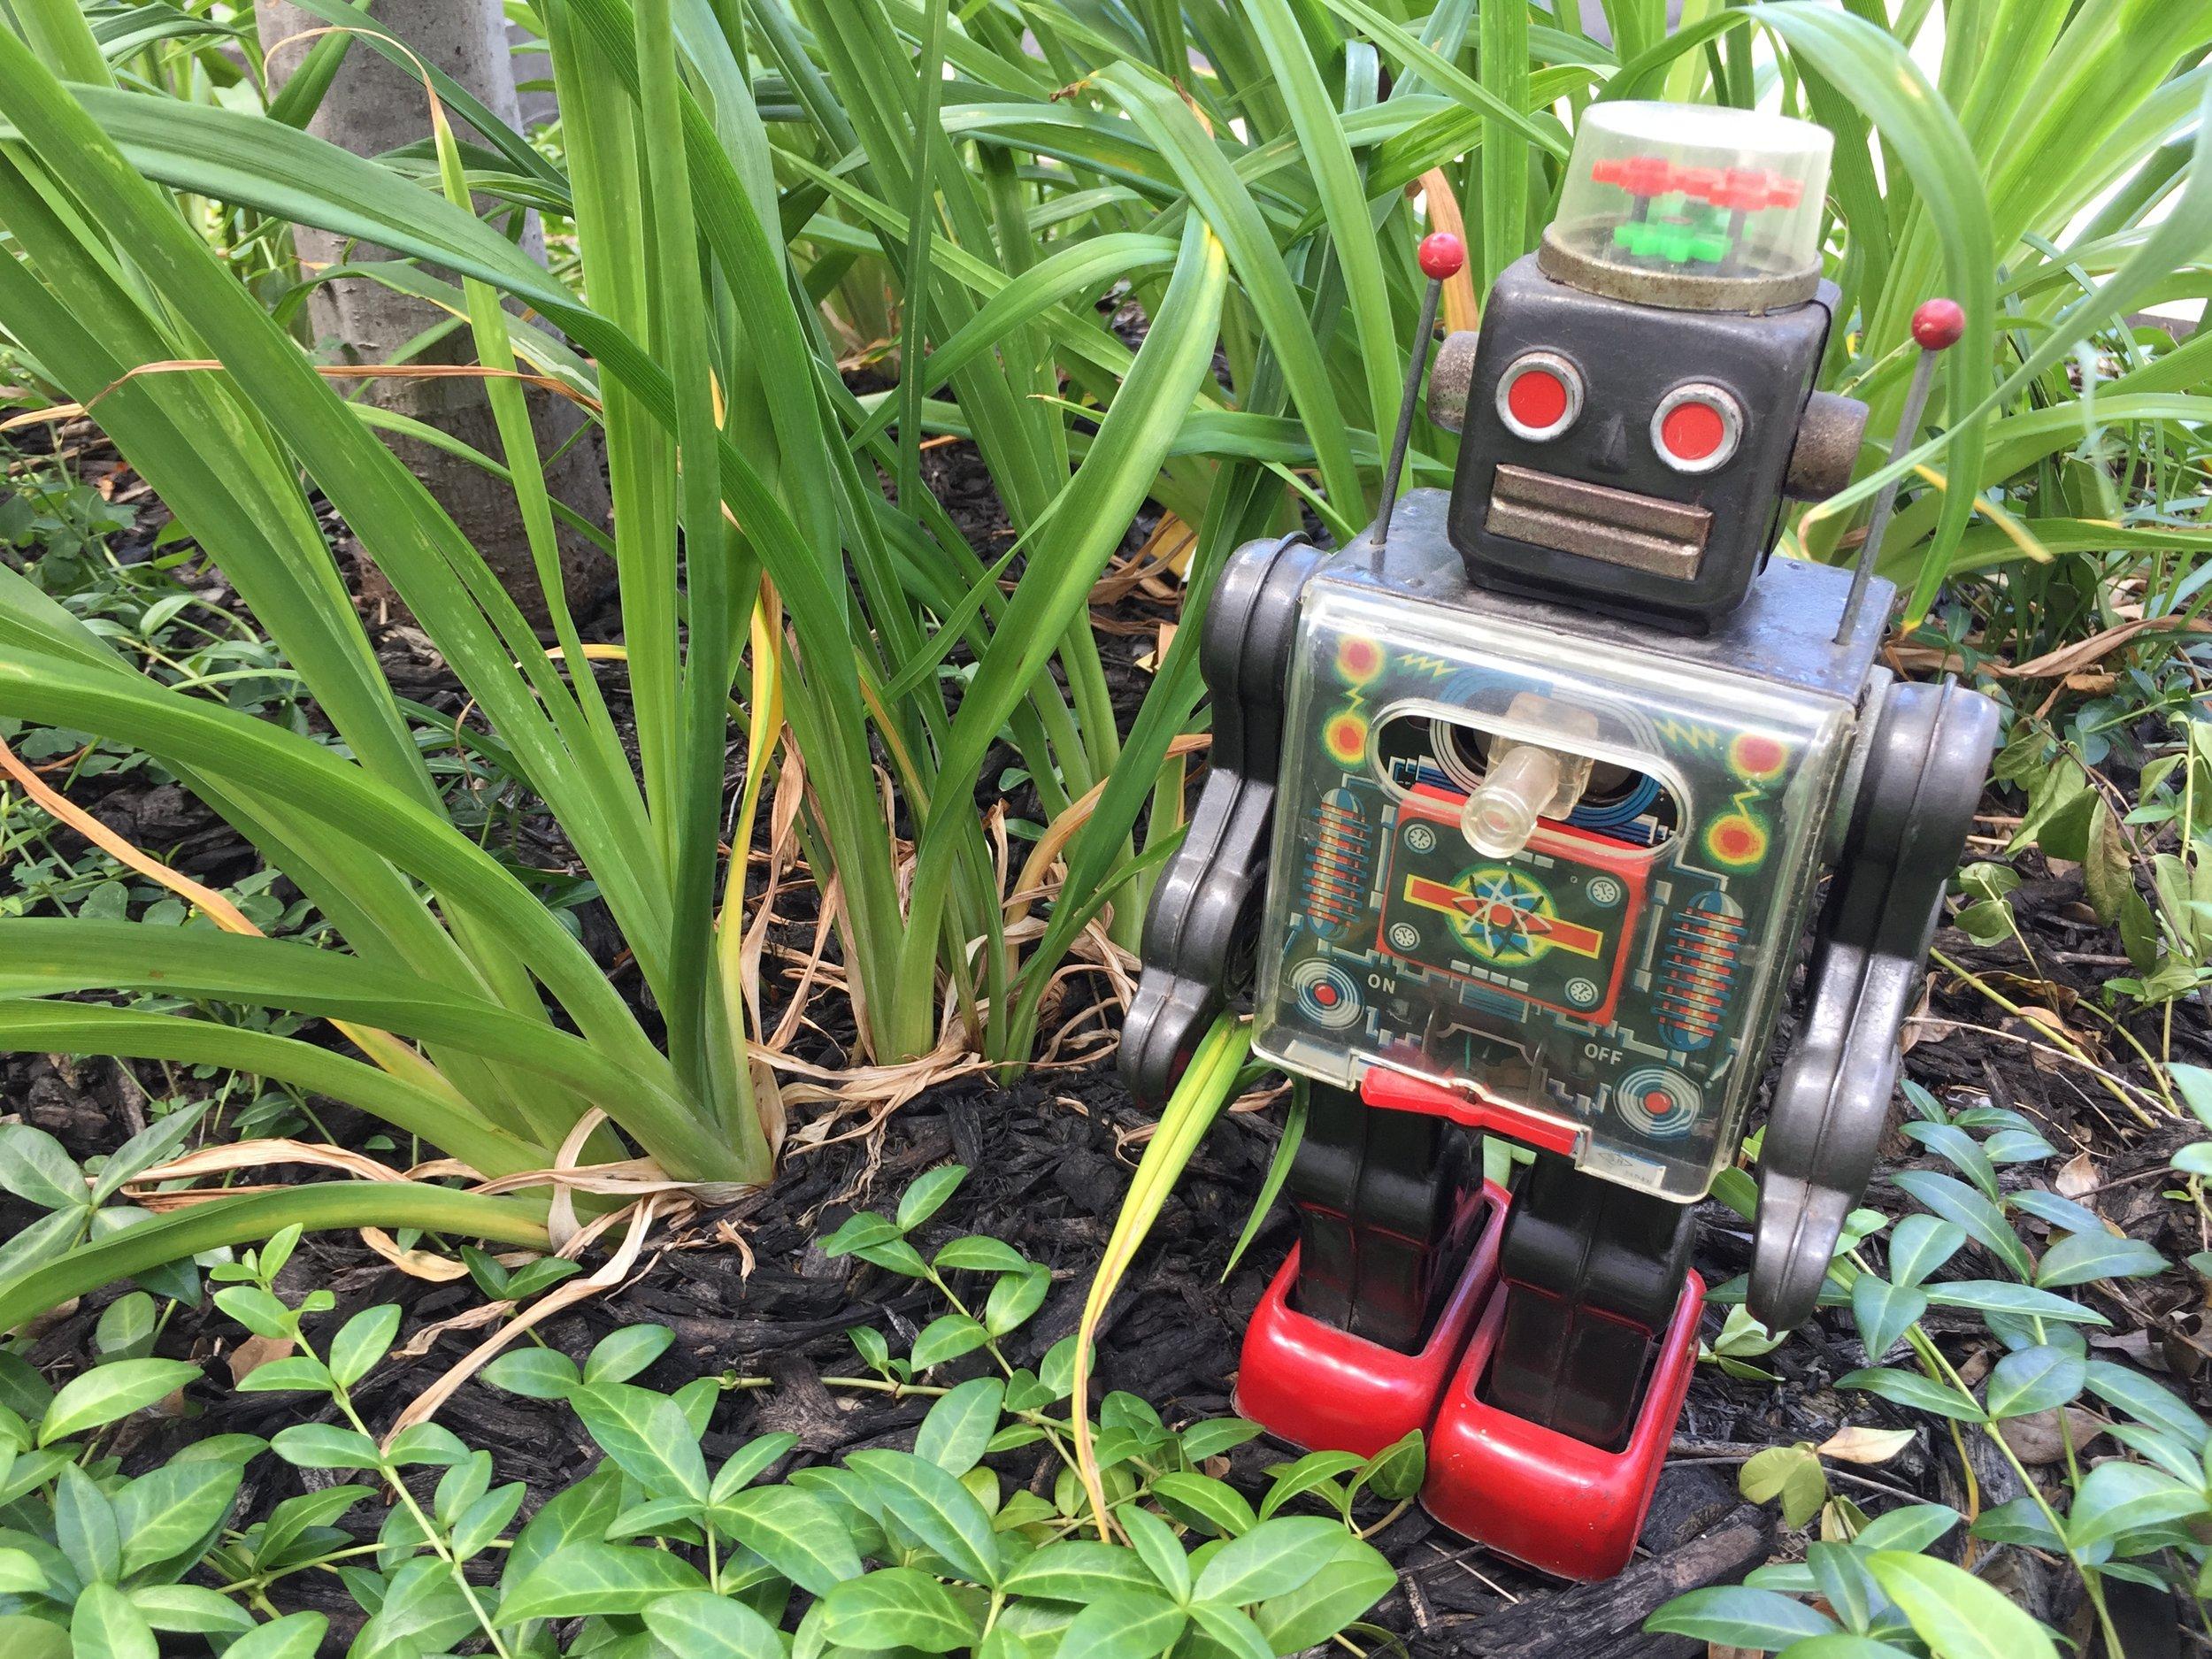 A portrait of the author as a robot